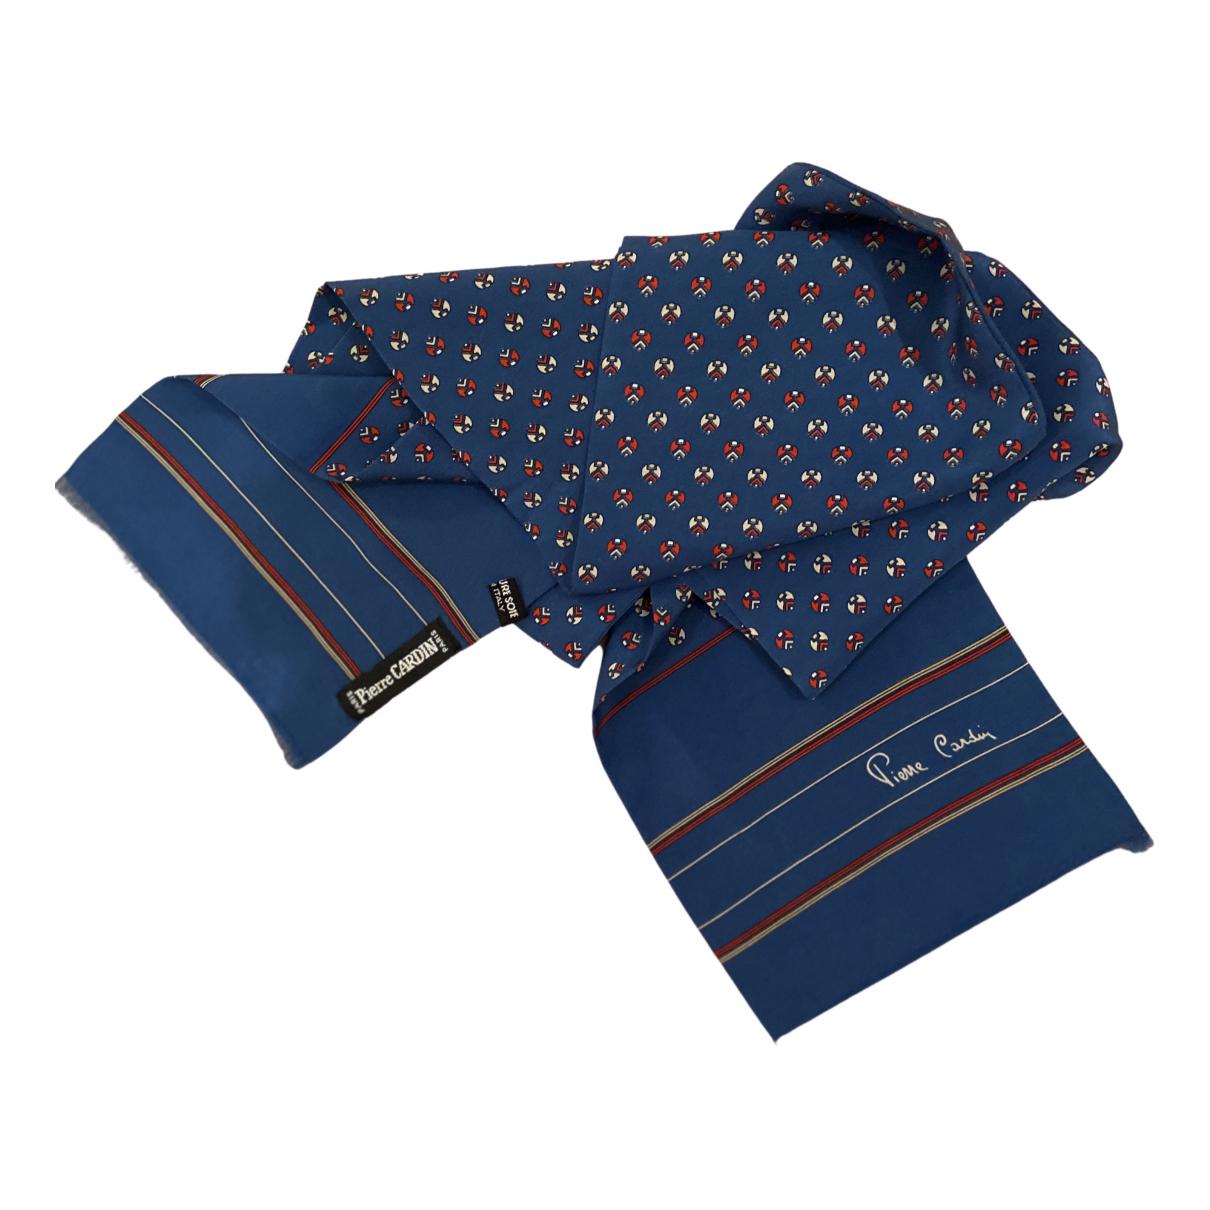 Pañuelo / bufanda de Seda Pierre Cardin